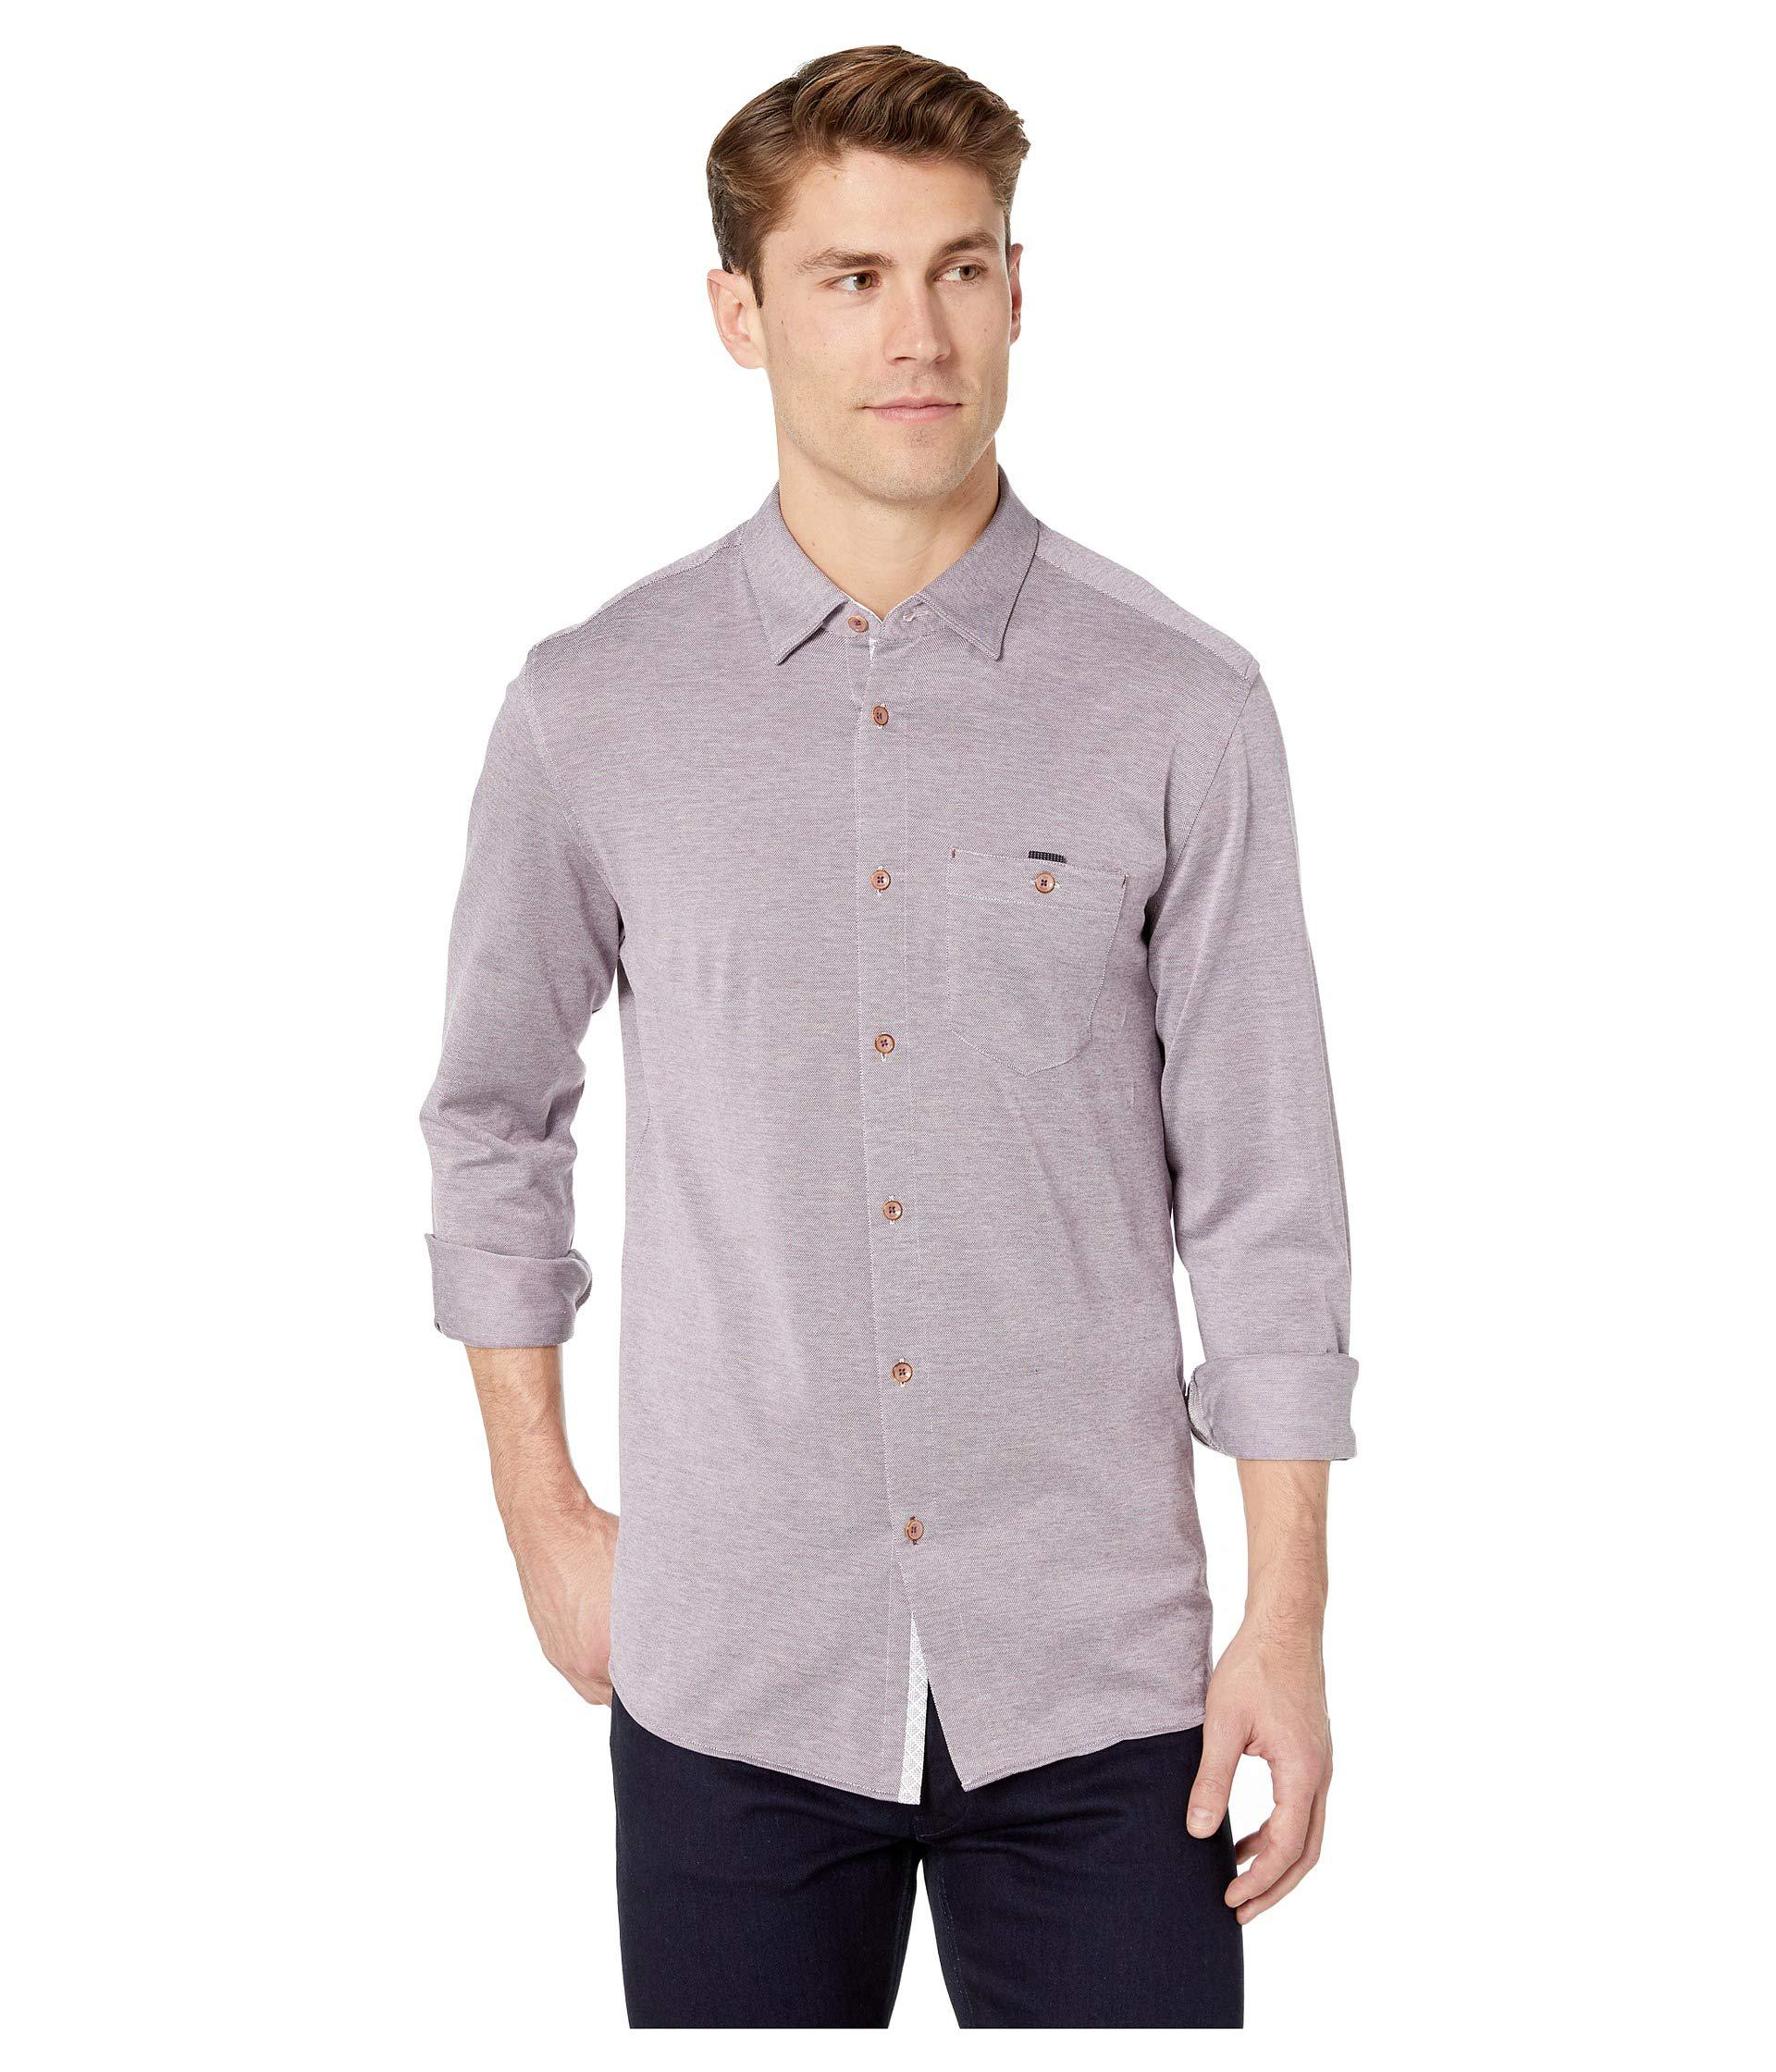 3a9b3661f795e7 Lyst - Ted Baker Timothy Long Sleeve Jersey Shirt (purple) Men s ...